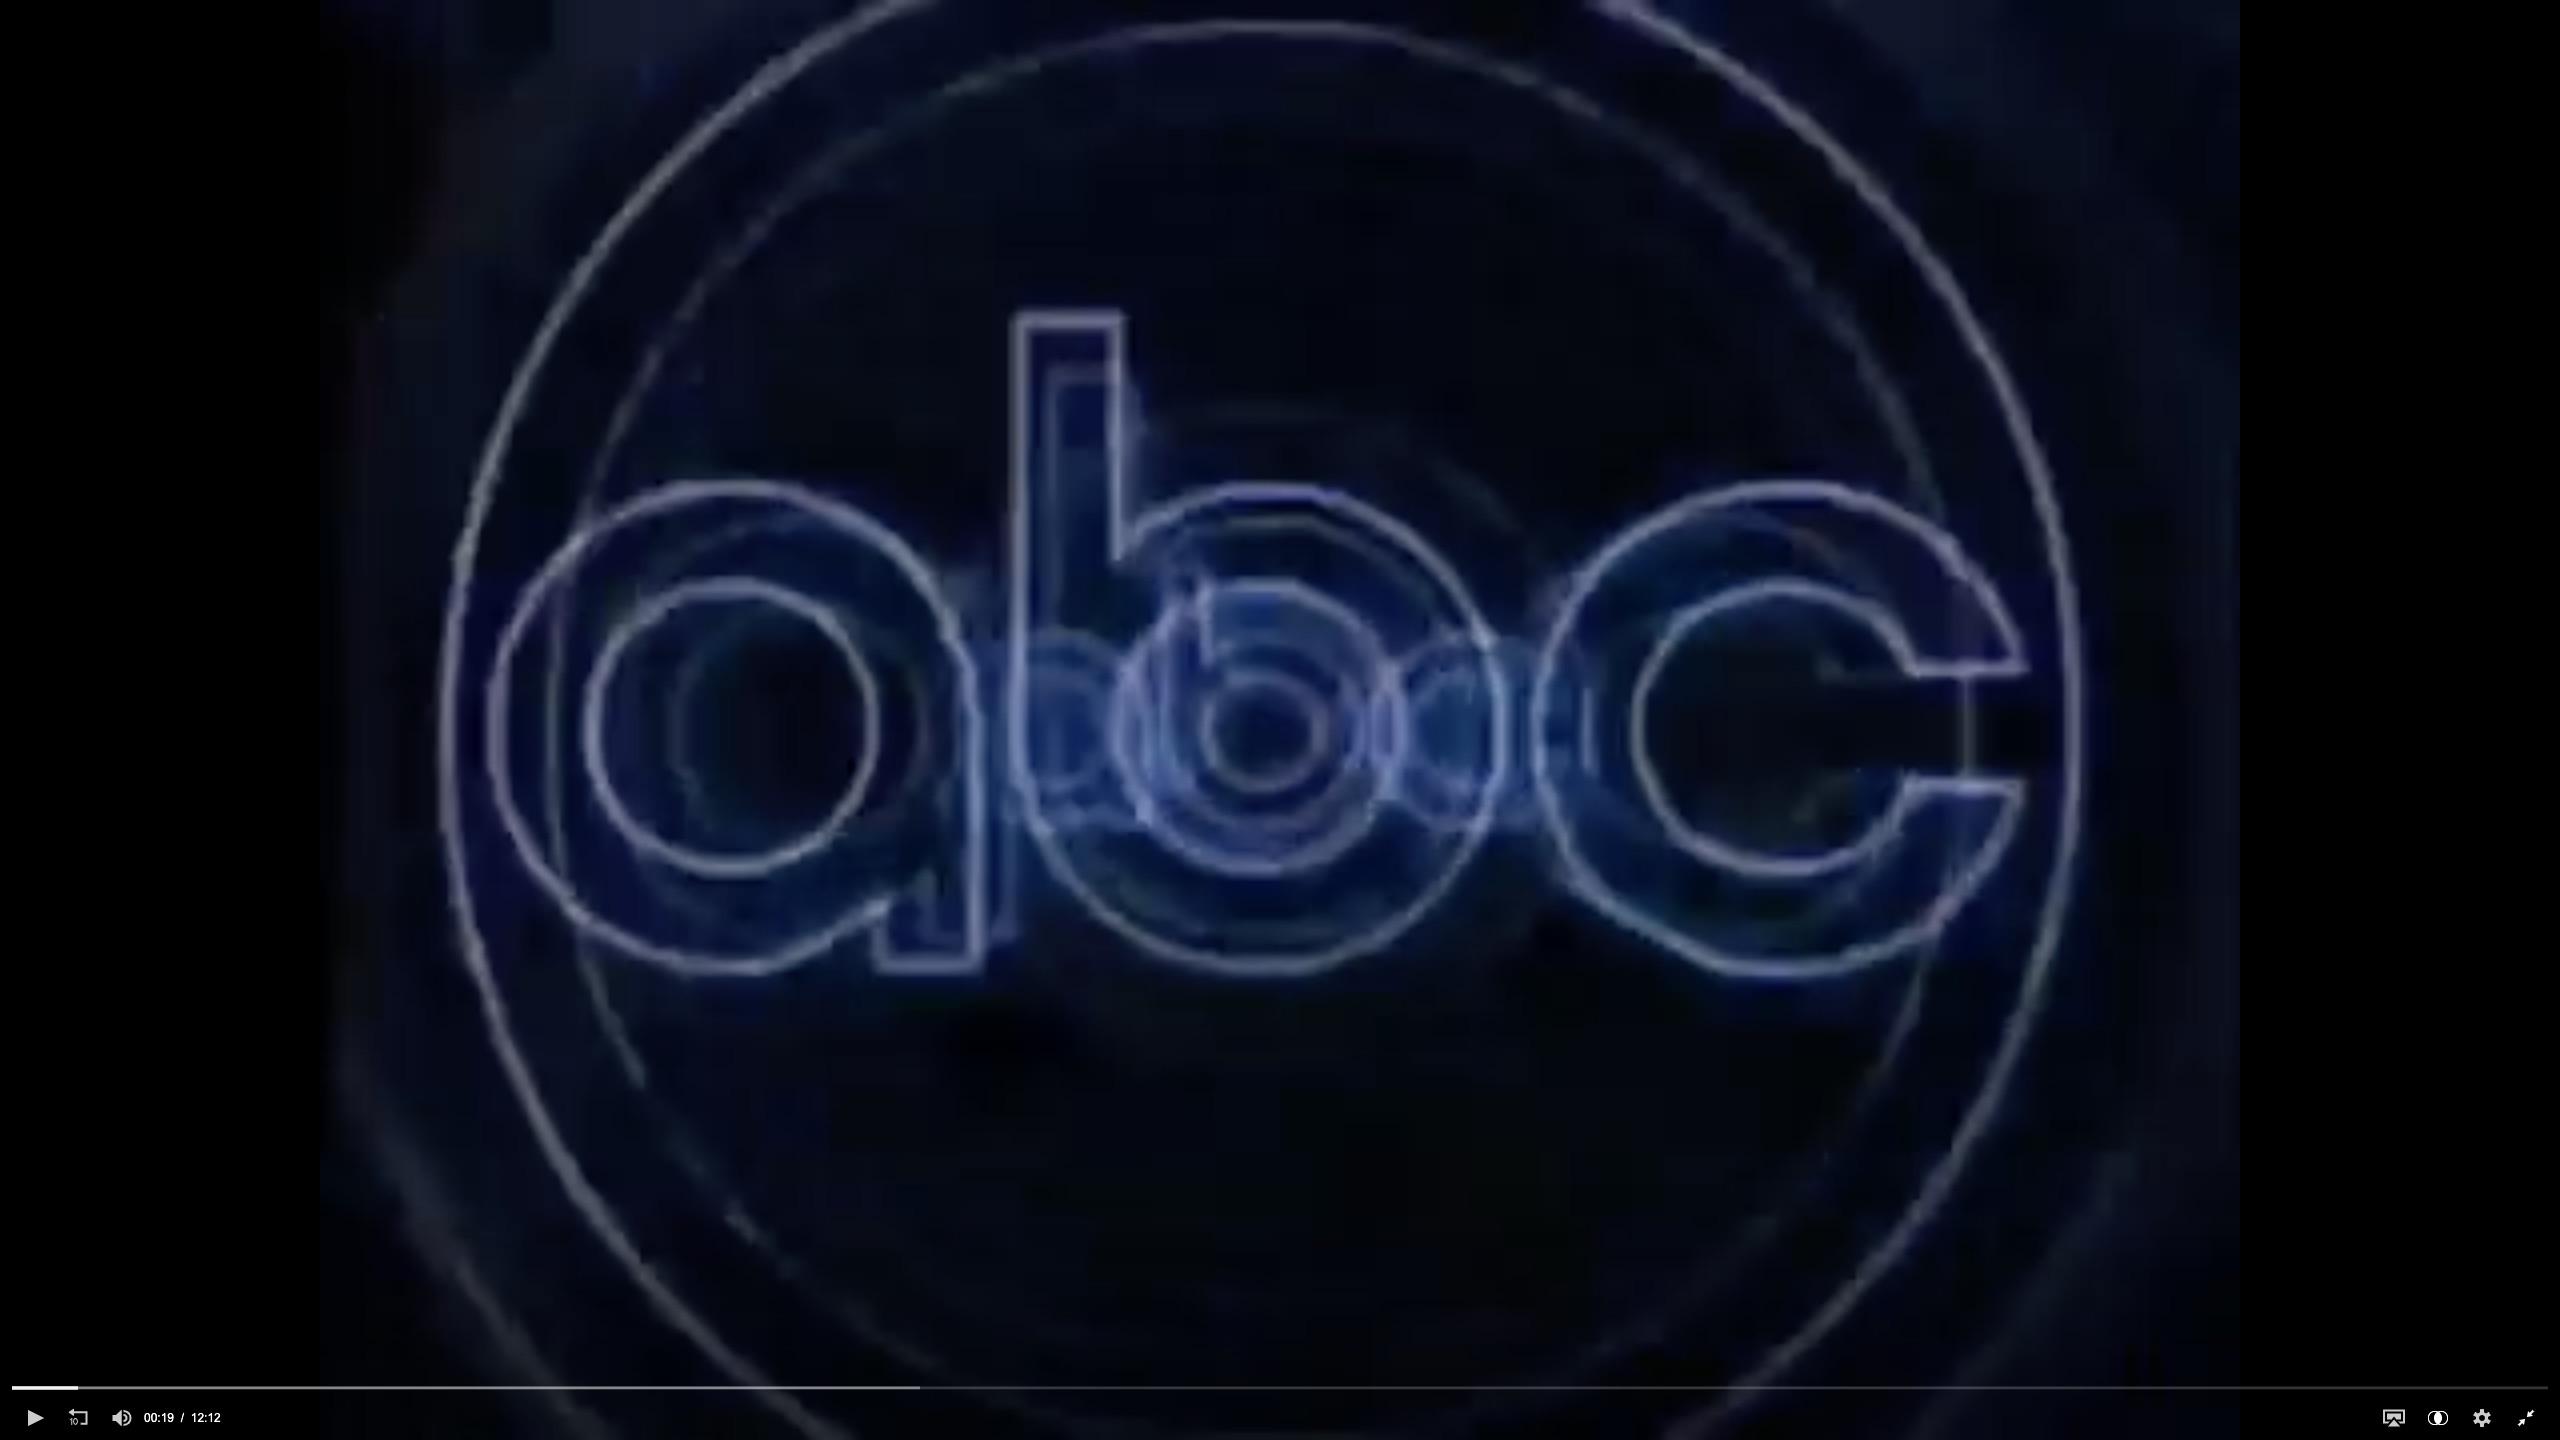 1972 Saturday Night TV Shows